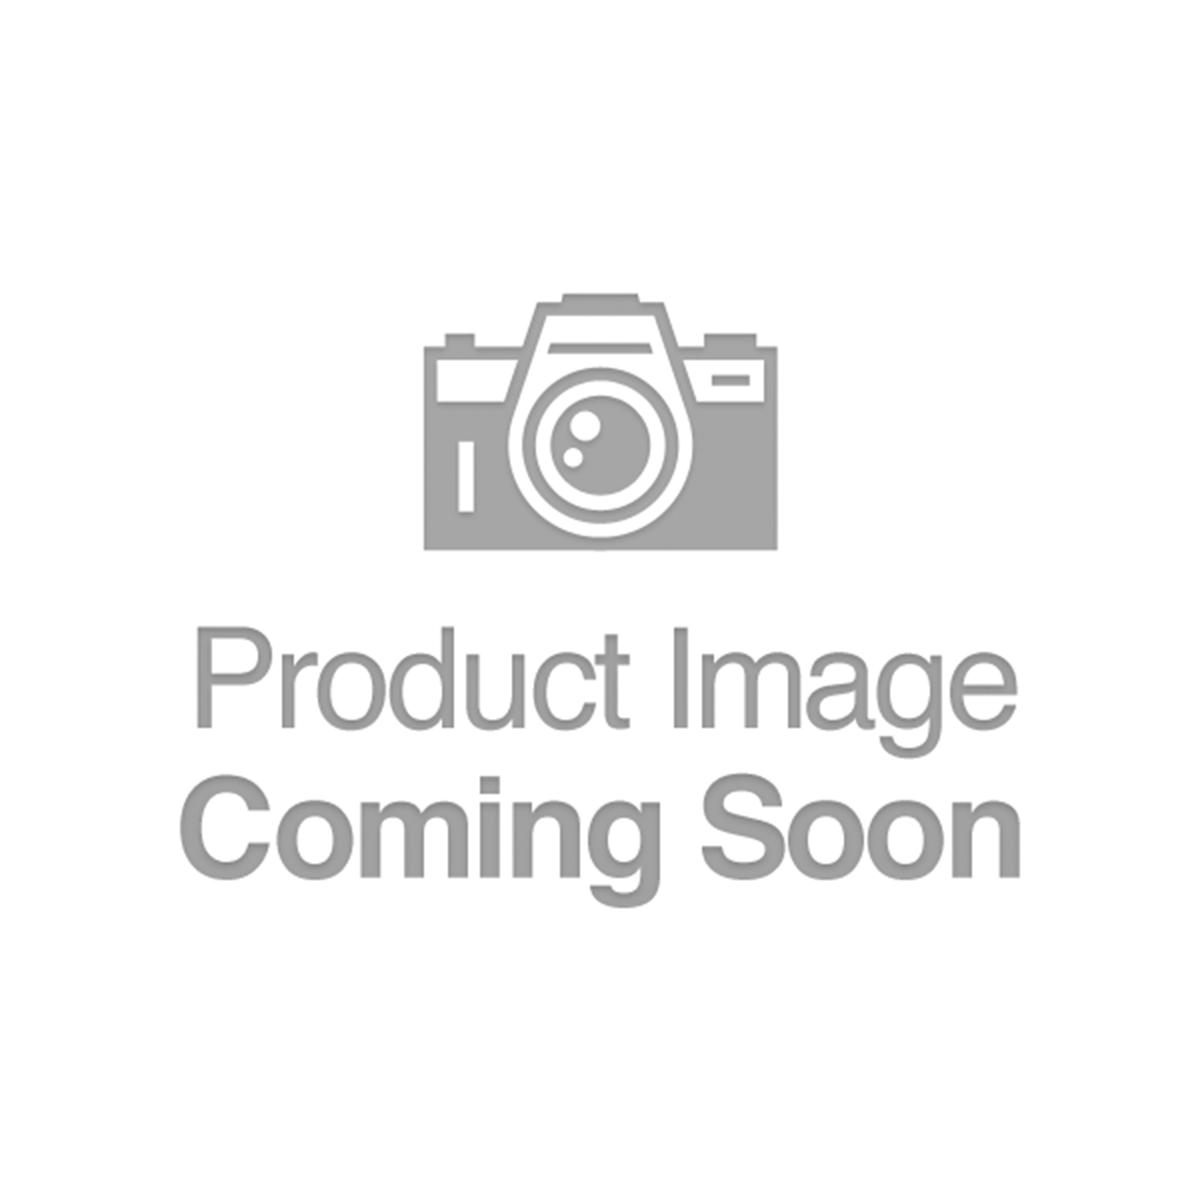 Saint Edward - Nebraska - CH 5793 - FR 1801-1 - PMG Very Fine 25